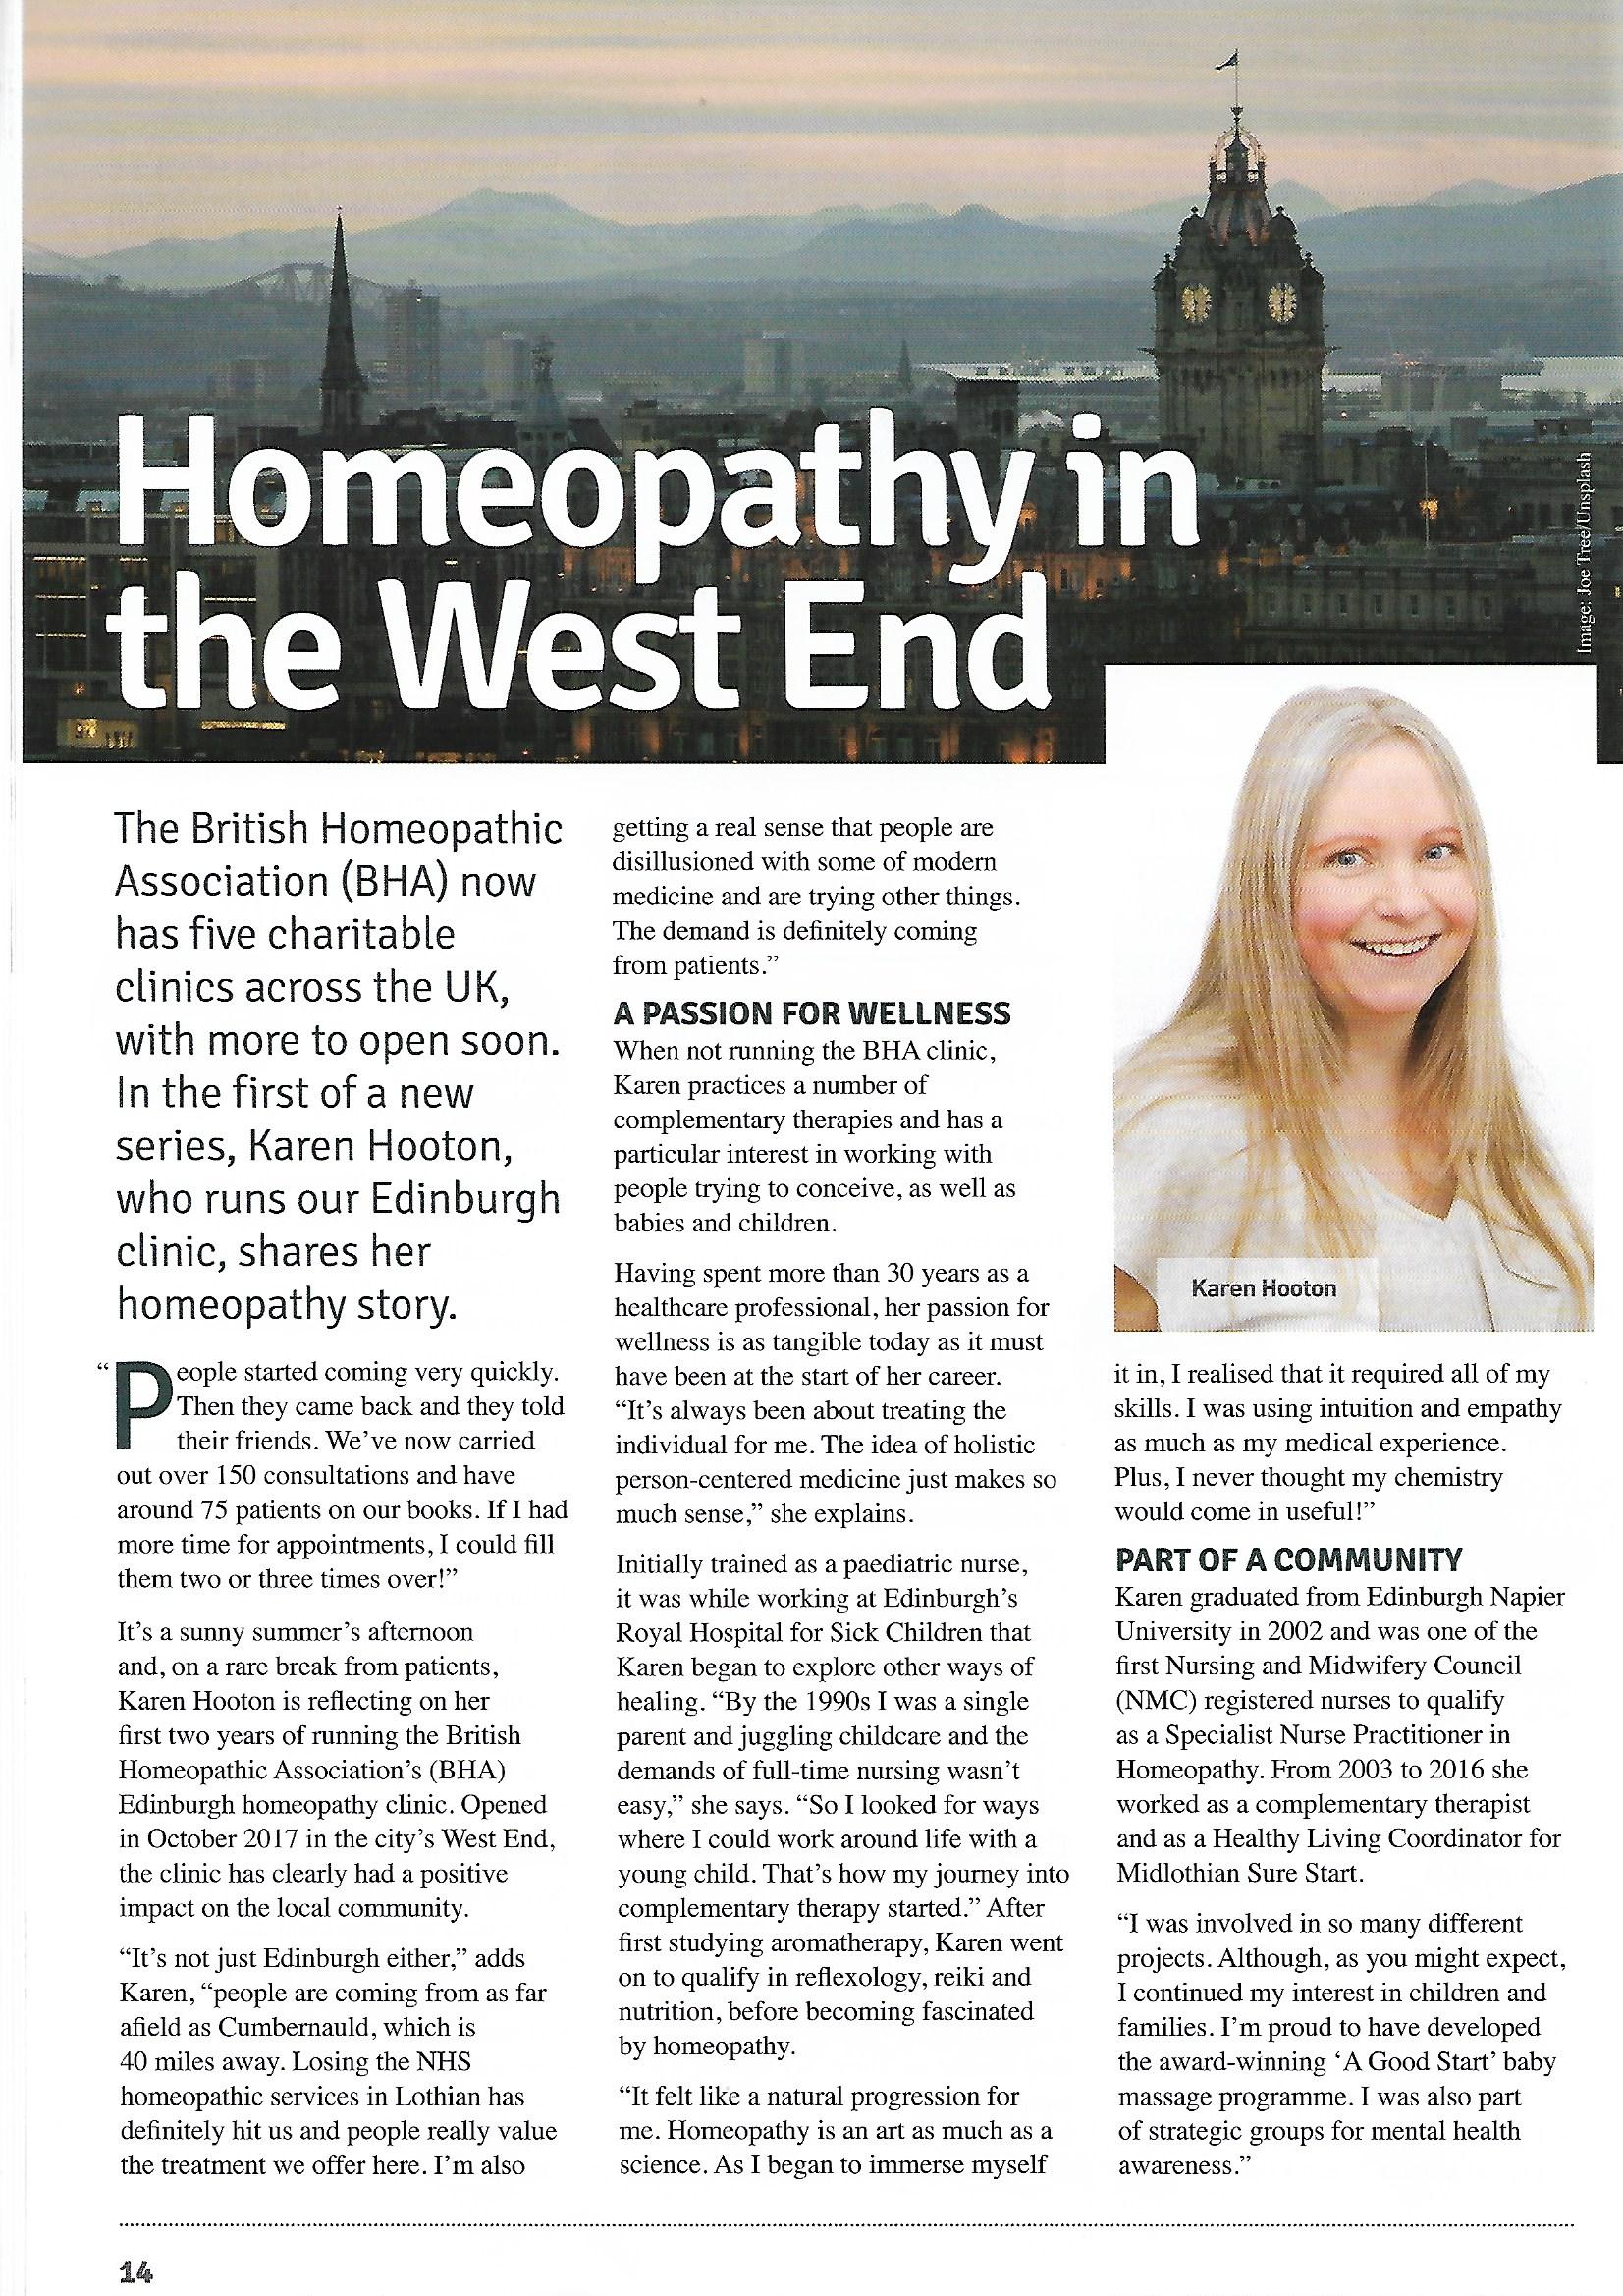 Journal article for BHA clinic in Edinburgh